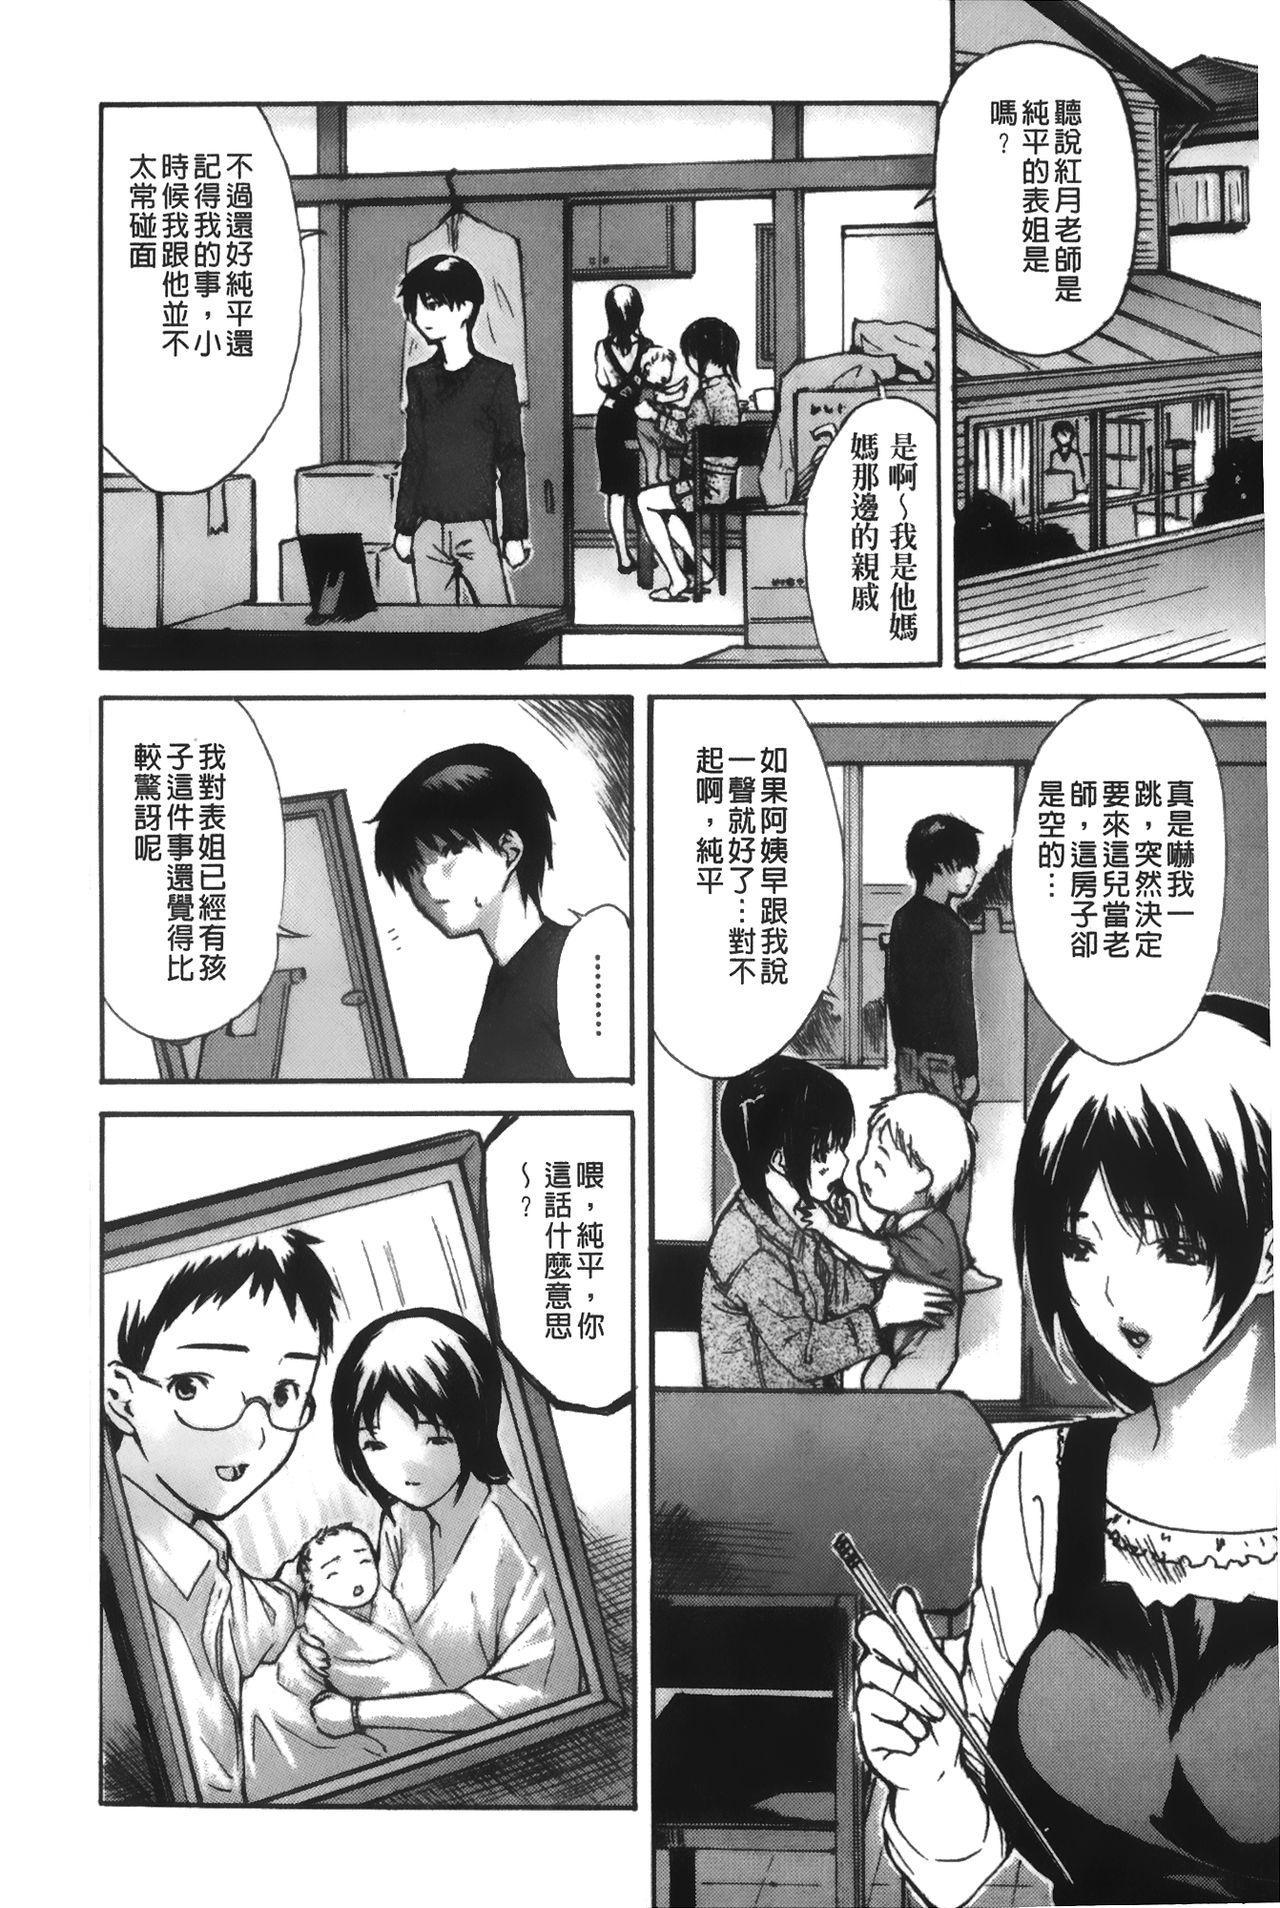 Tonari no Minano Sensei 4 | 隔壁的美奈乃老師 4 57